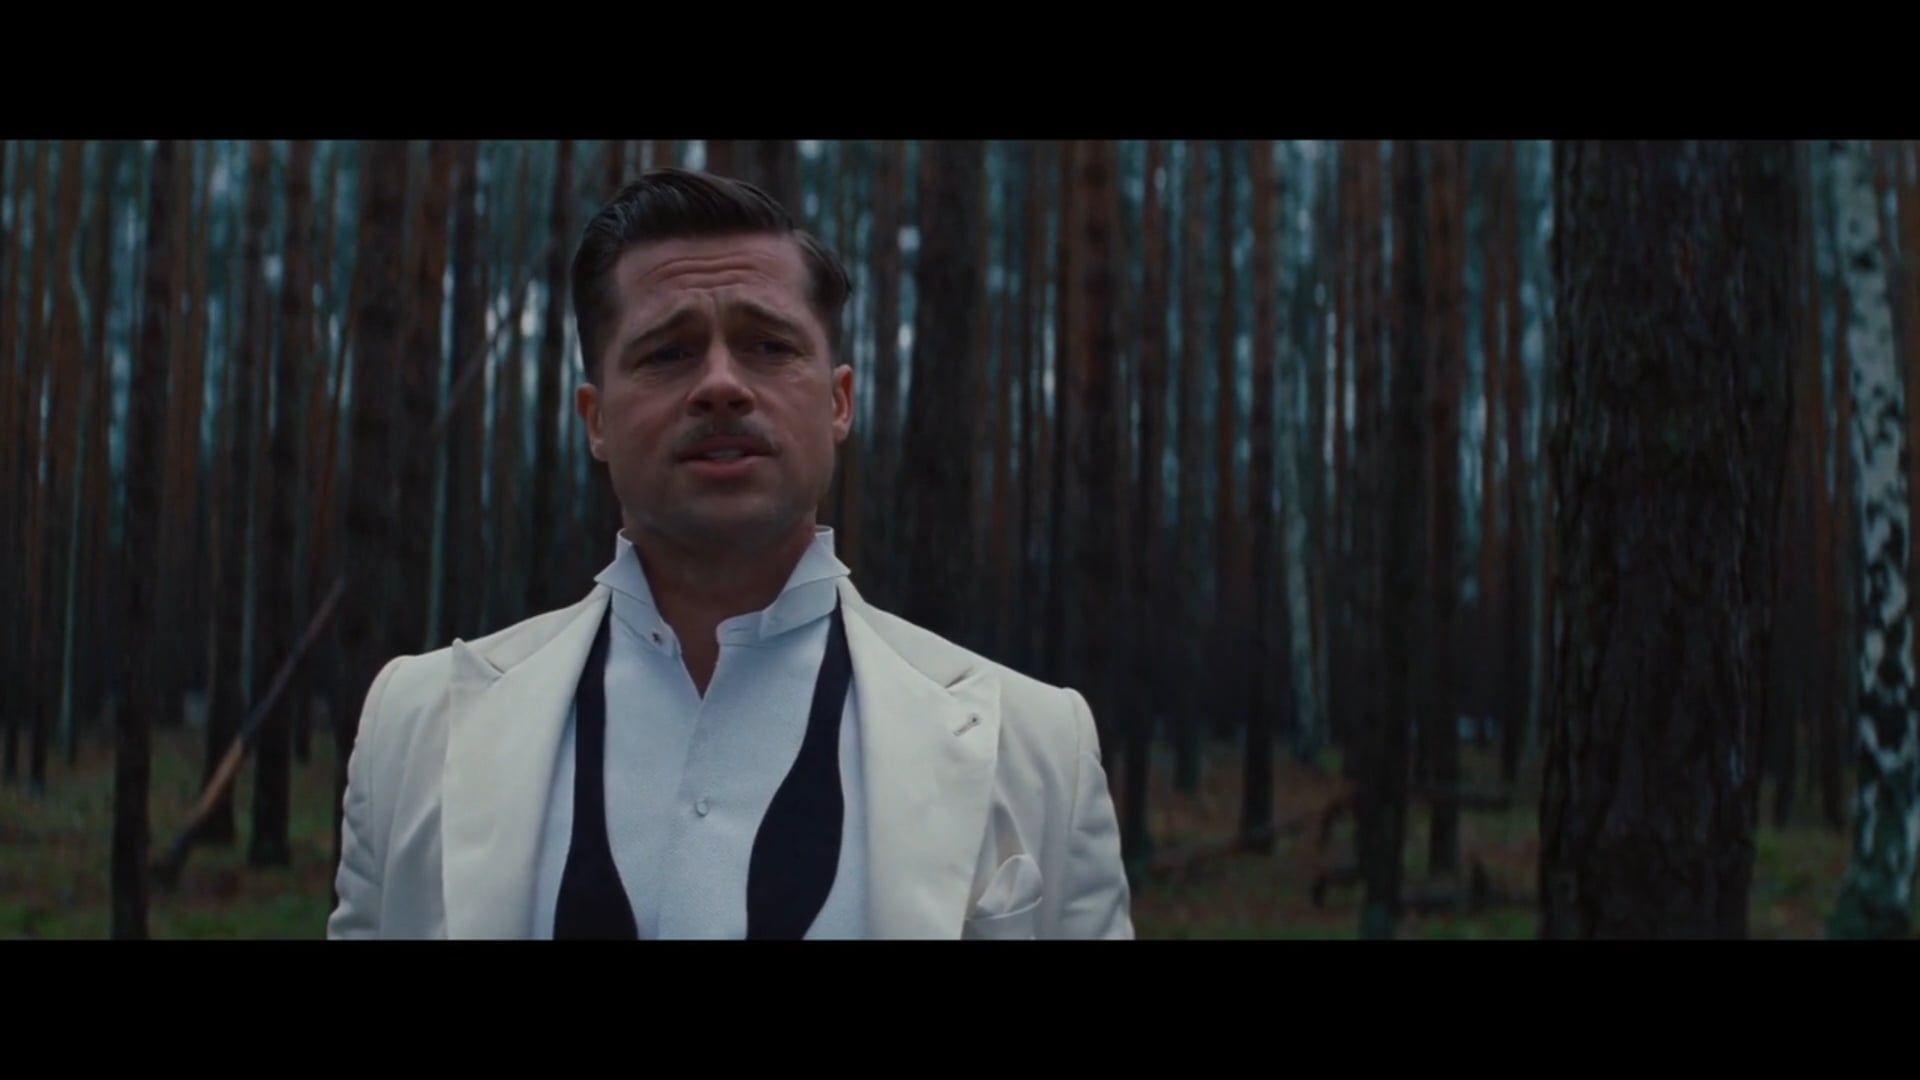 Pin on FILM